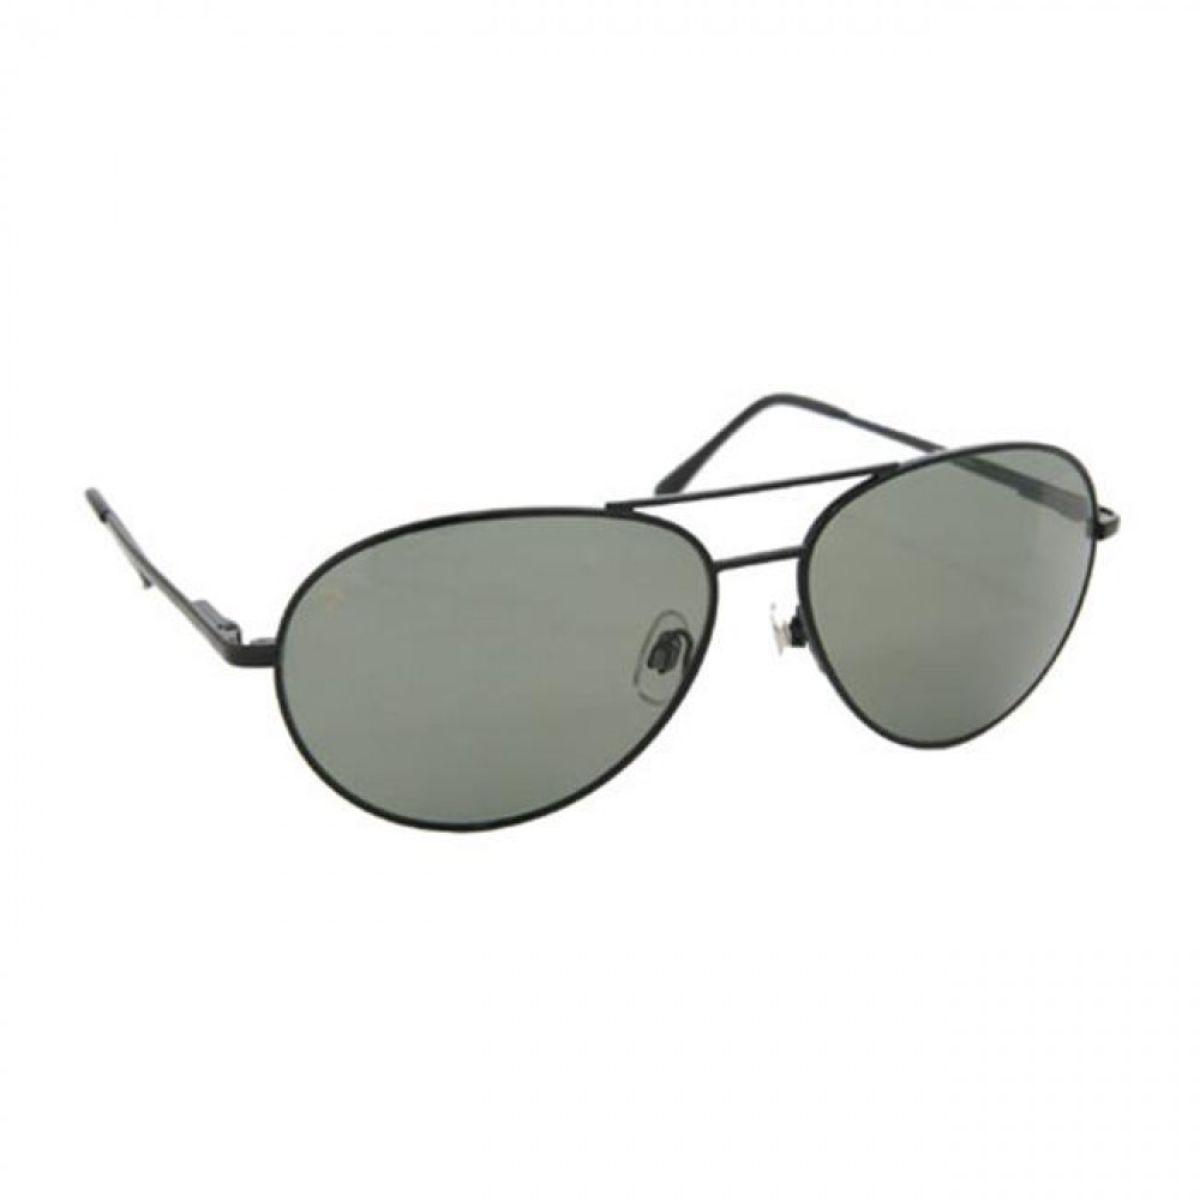 Aviator Sunglasses - Coppermax 3708GPP BLK/SMOKE Aviator Polarized Sunglasses - Matte Black - Smoke Lens